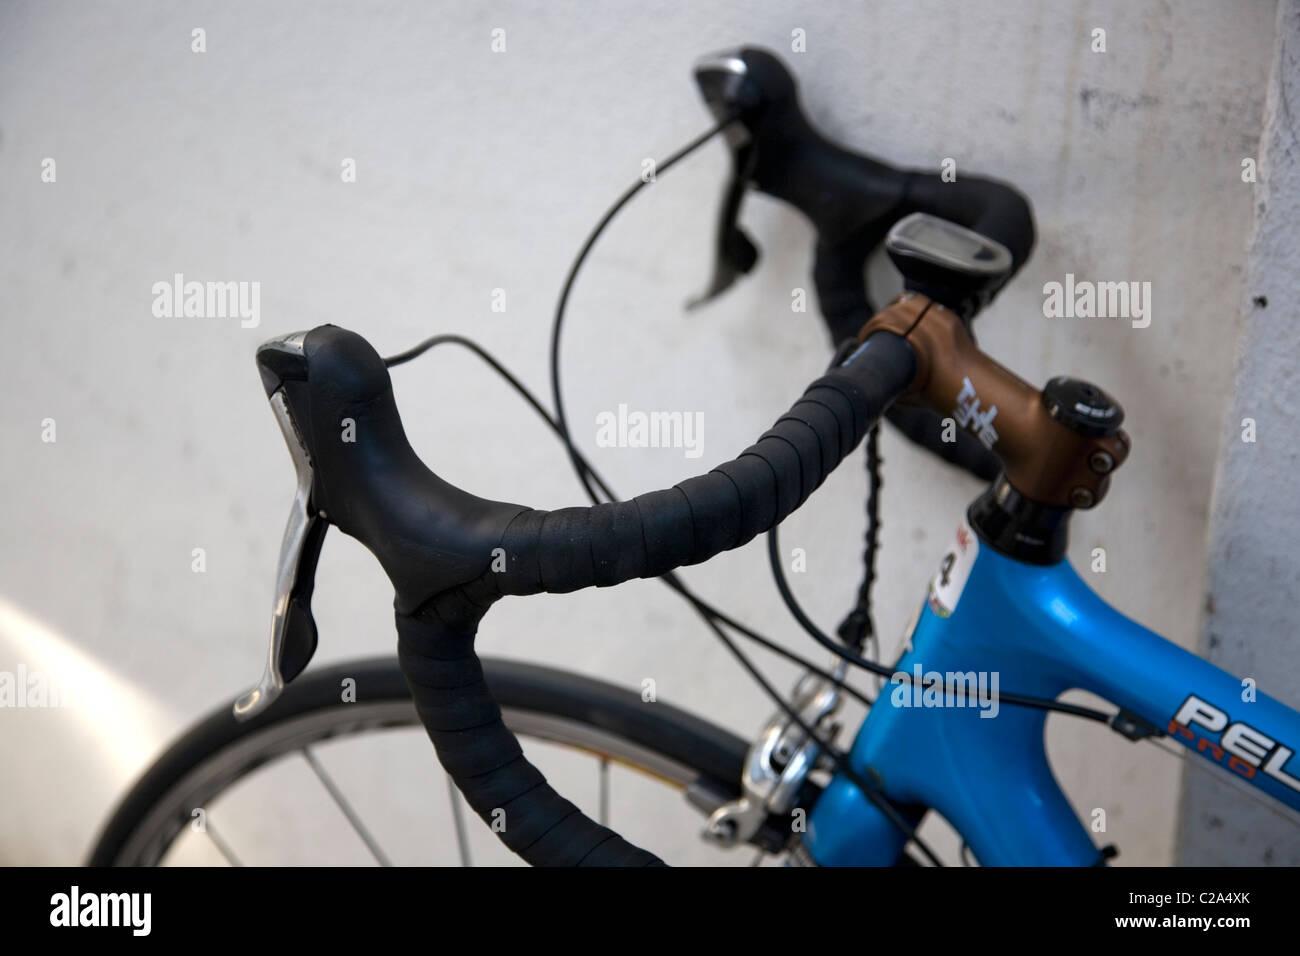 Bicycle Handlebars - Stock Image